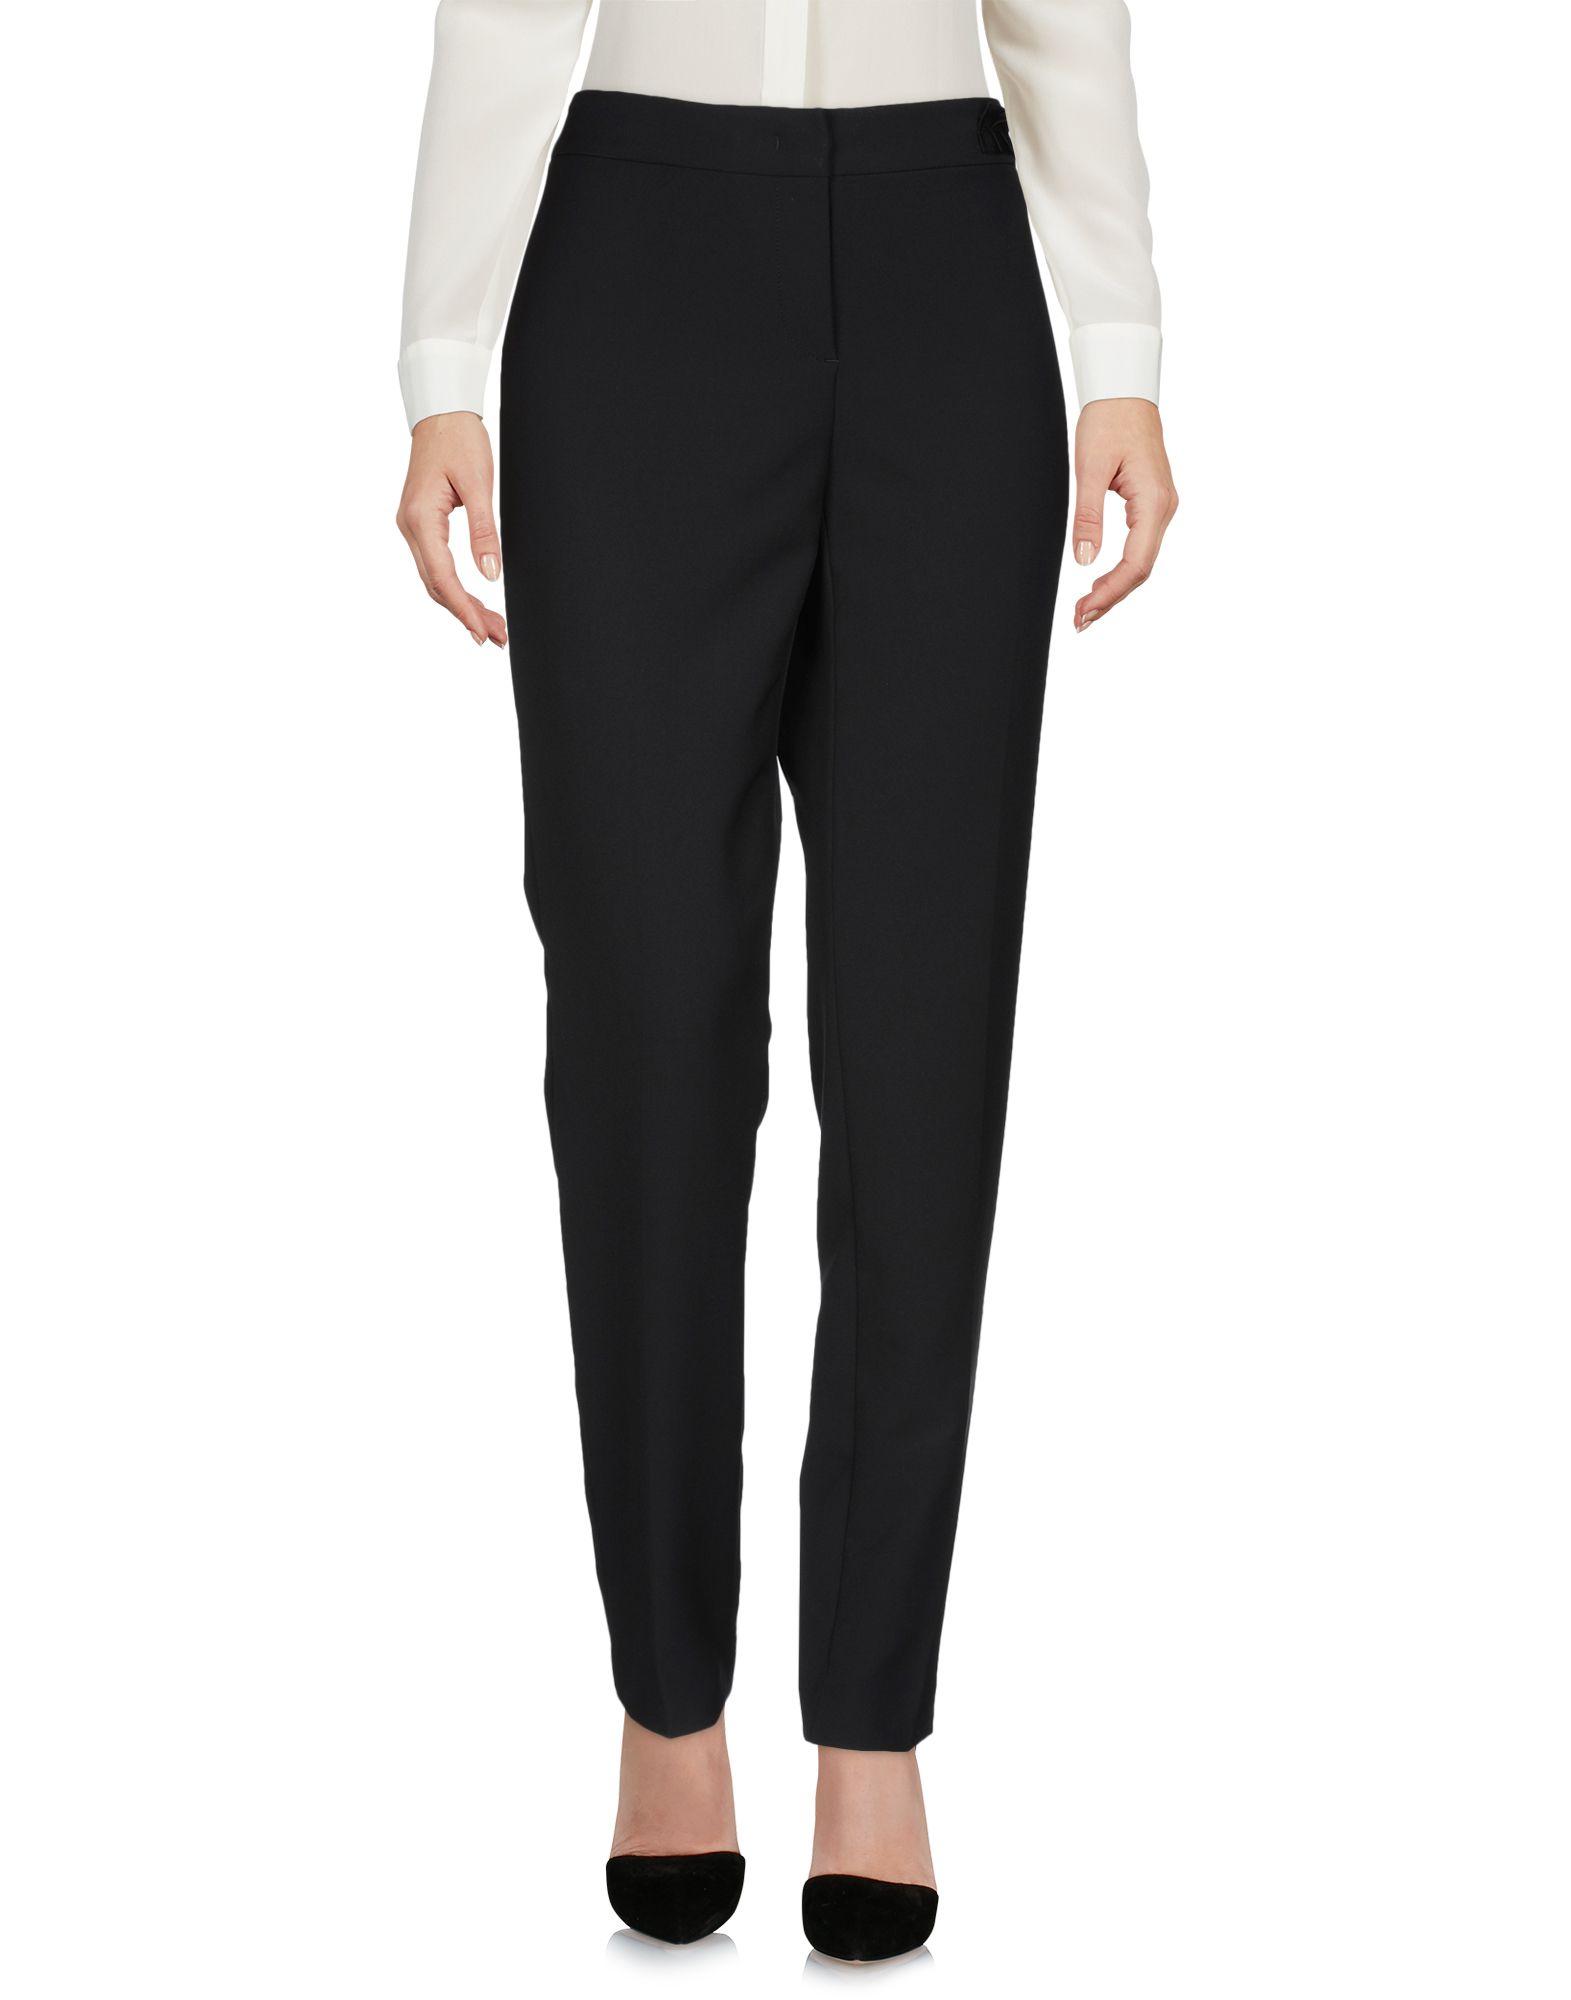 Pantalone Pantalone Liu •Jo donna - 13219213JX  Online zum besten Preis